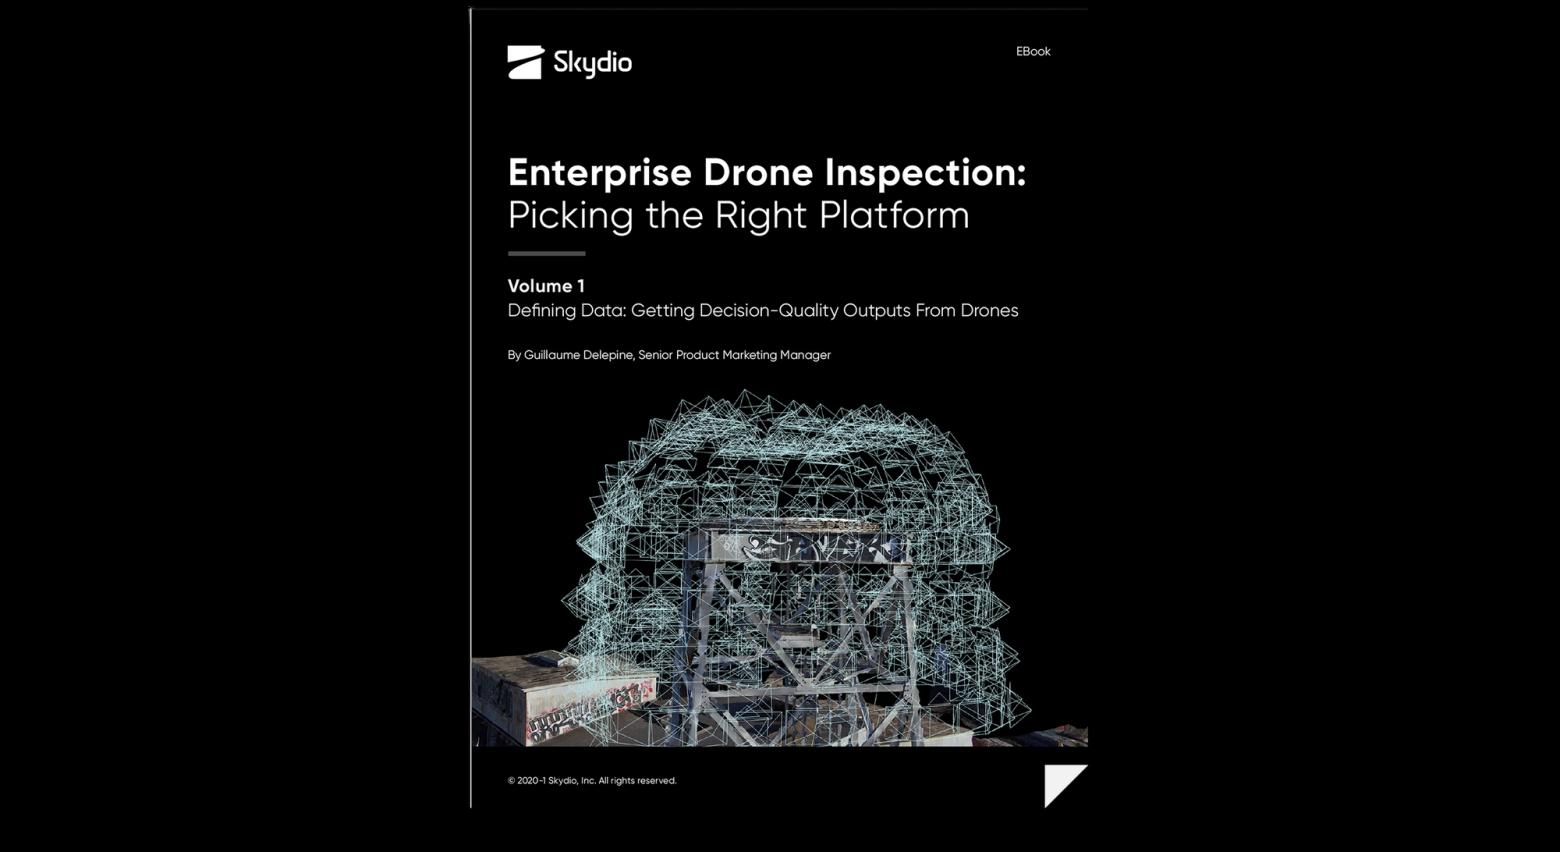 Skydio 3D Scan Crane Mast Drone Inspection eBook